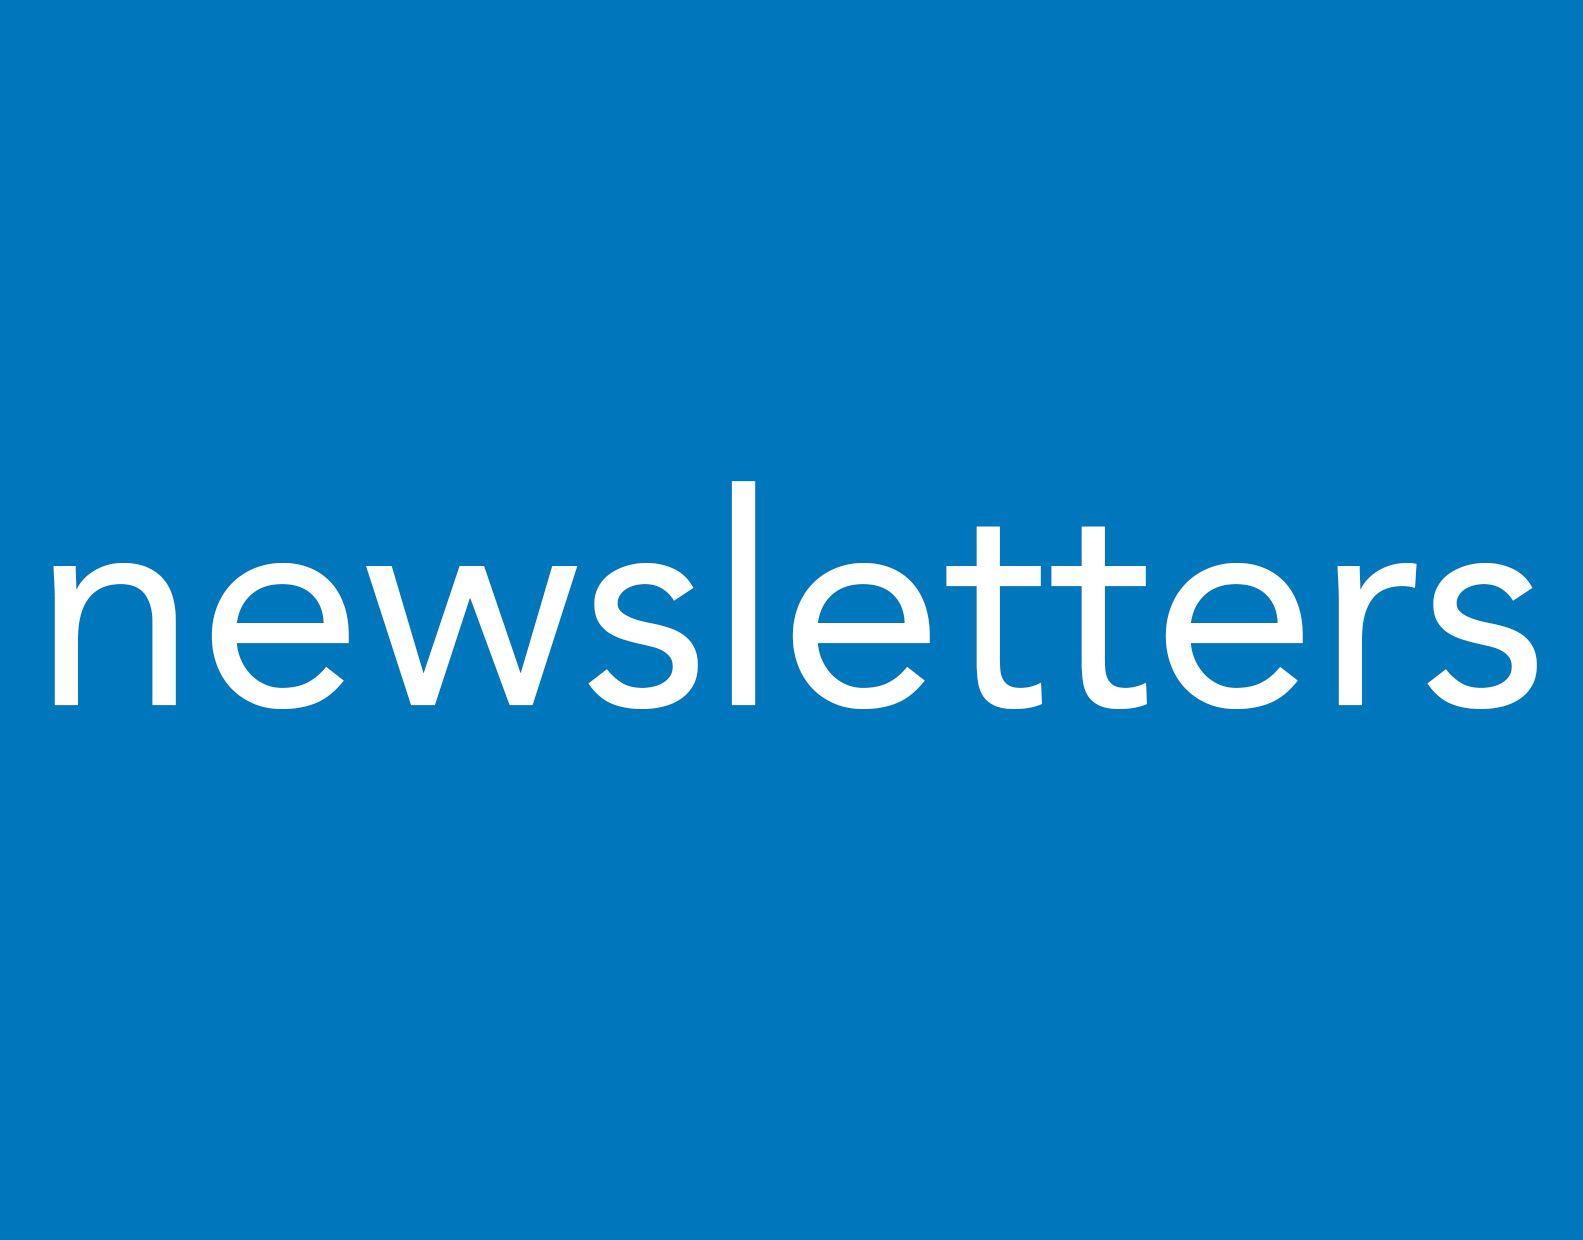 Portfolio newsletters